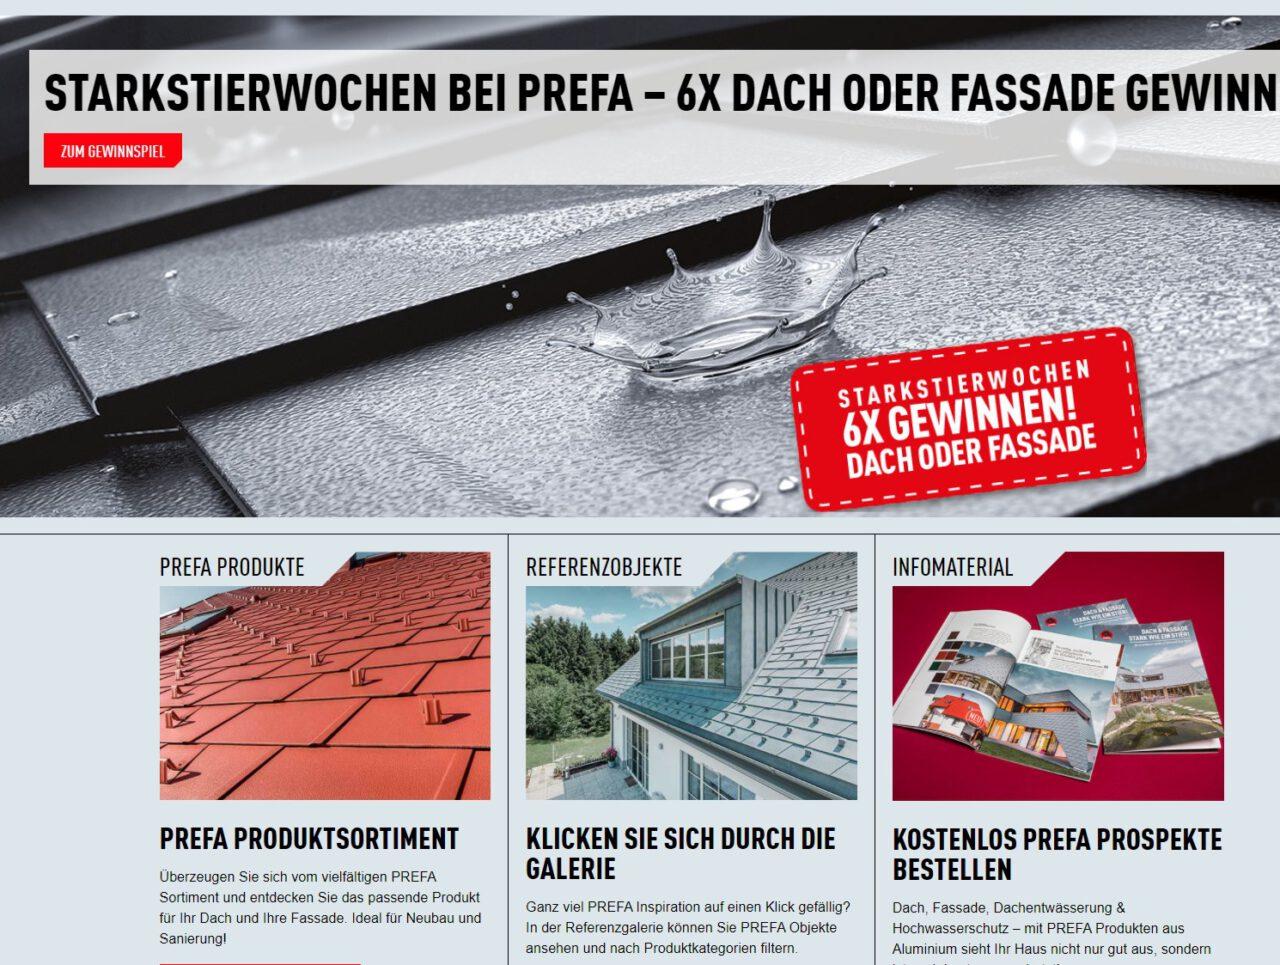 https://leydecker-landau.de/wp-content/uploads/2021/02/Dach-Fassadensysteme-aus-Aluminium-PREFA-www.prefa_.de_-1280x965.jpg